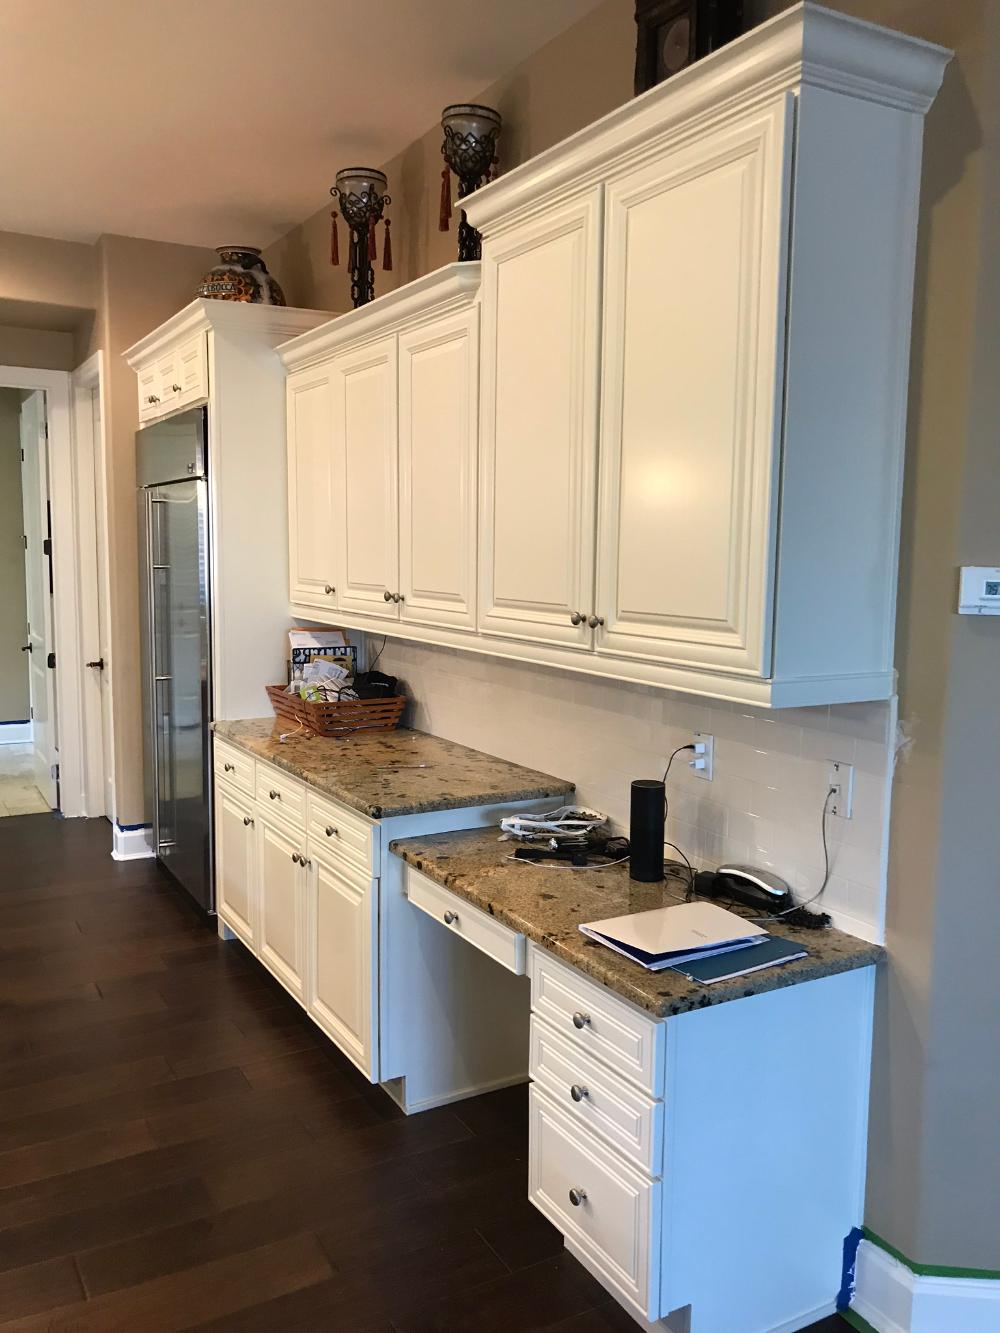 Four Peaks Painting Cabinet Refinishing Llc Phoenix Az 85032